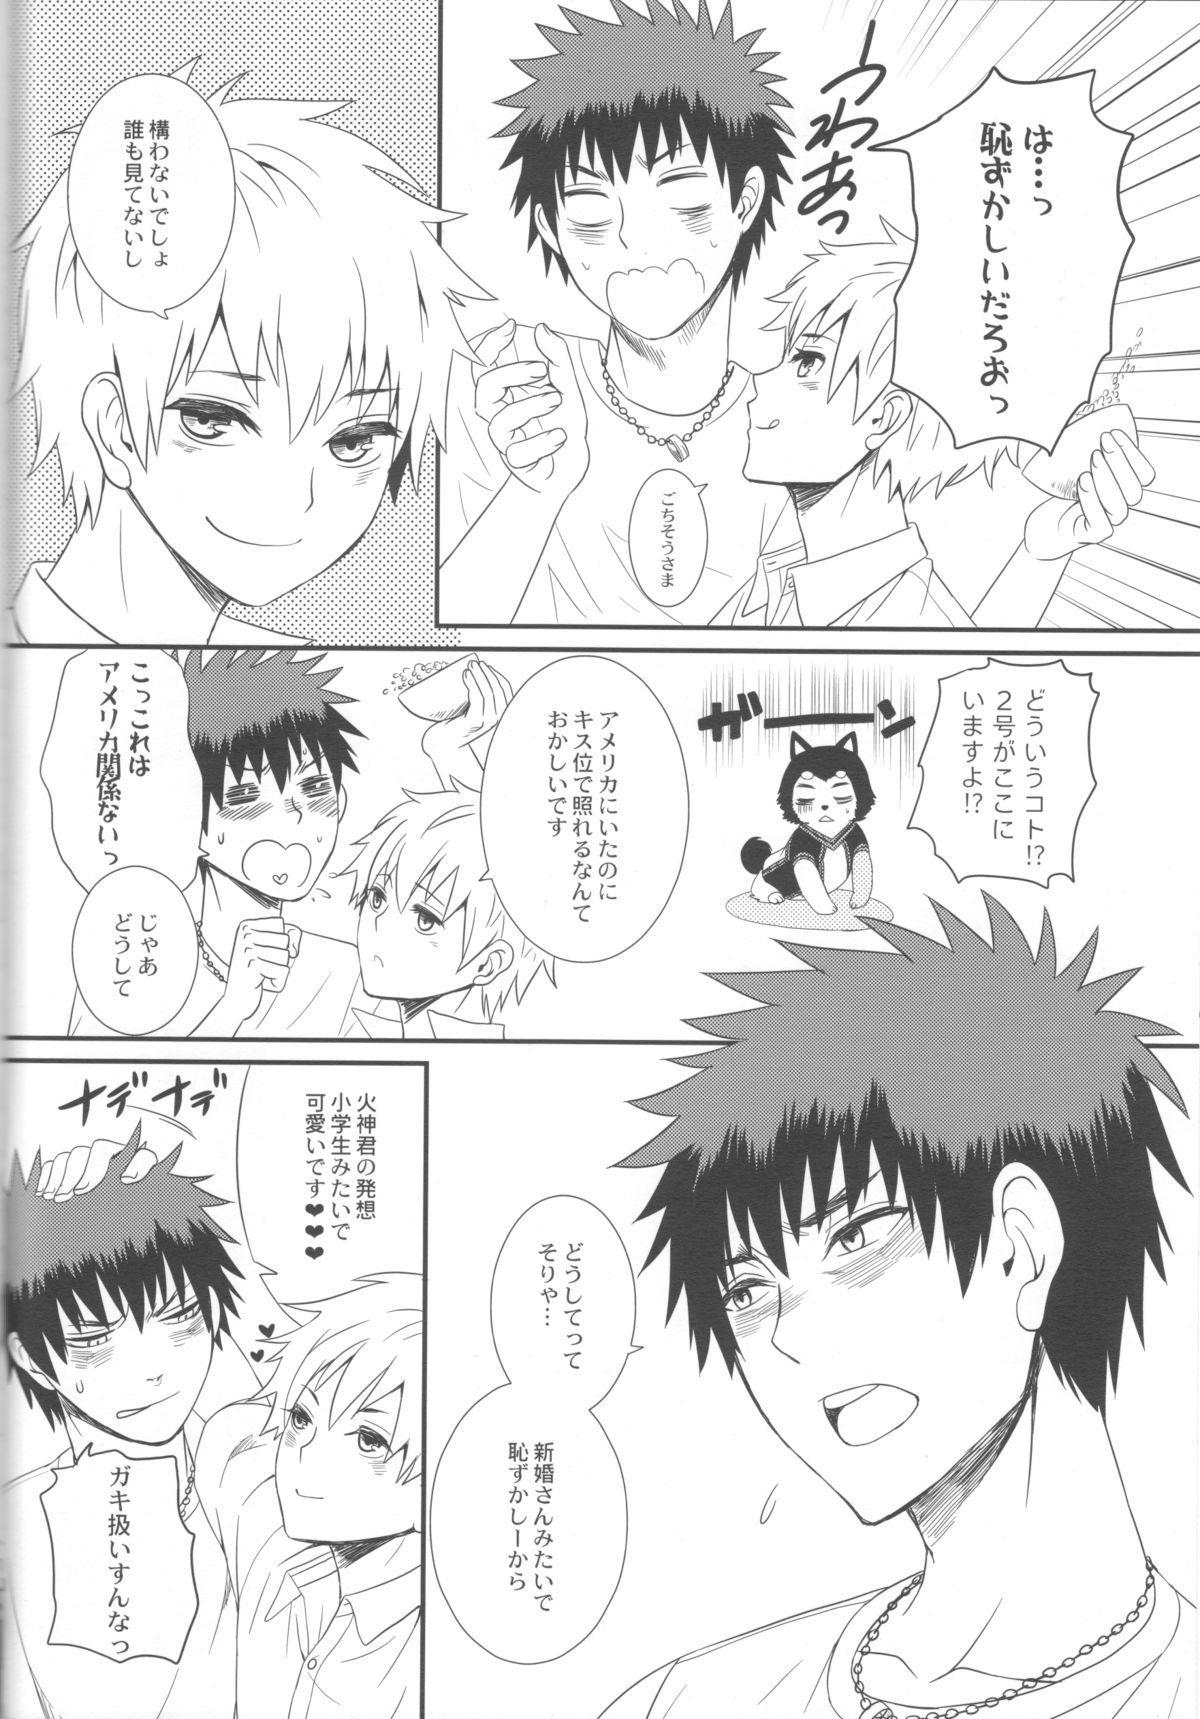 Kuroko to Kagami to Tokidoki Nigou to 8